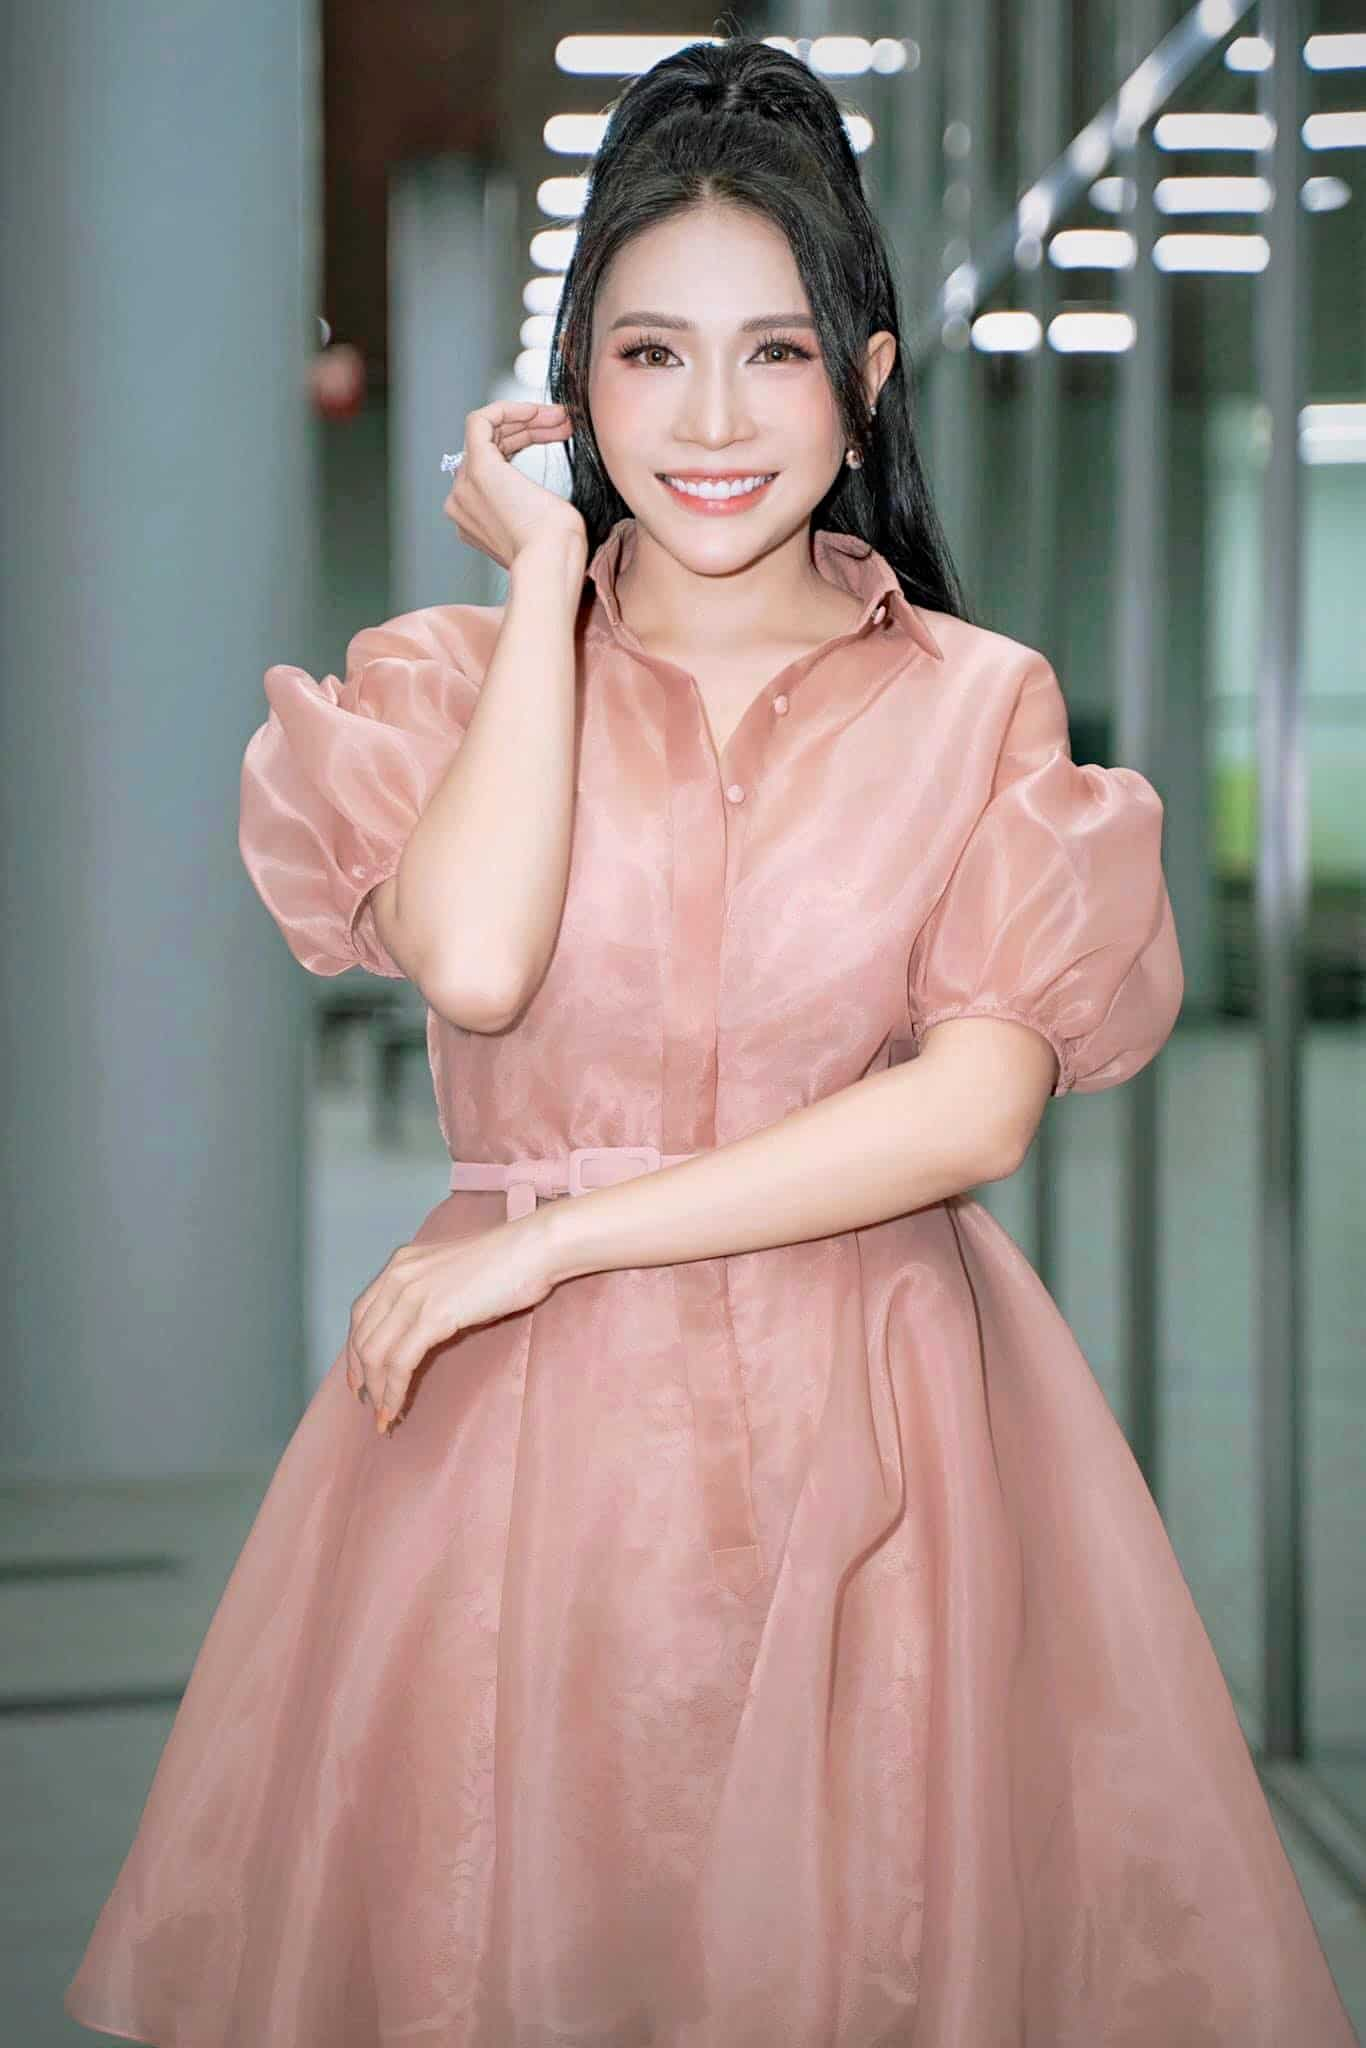 Image #1 from Ngoc Han